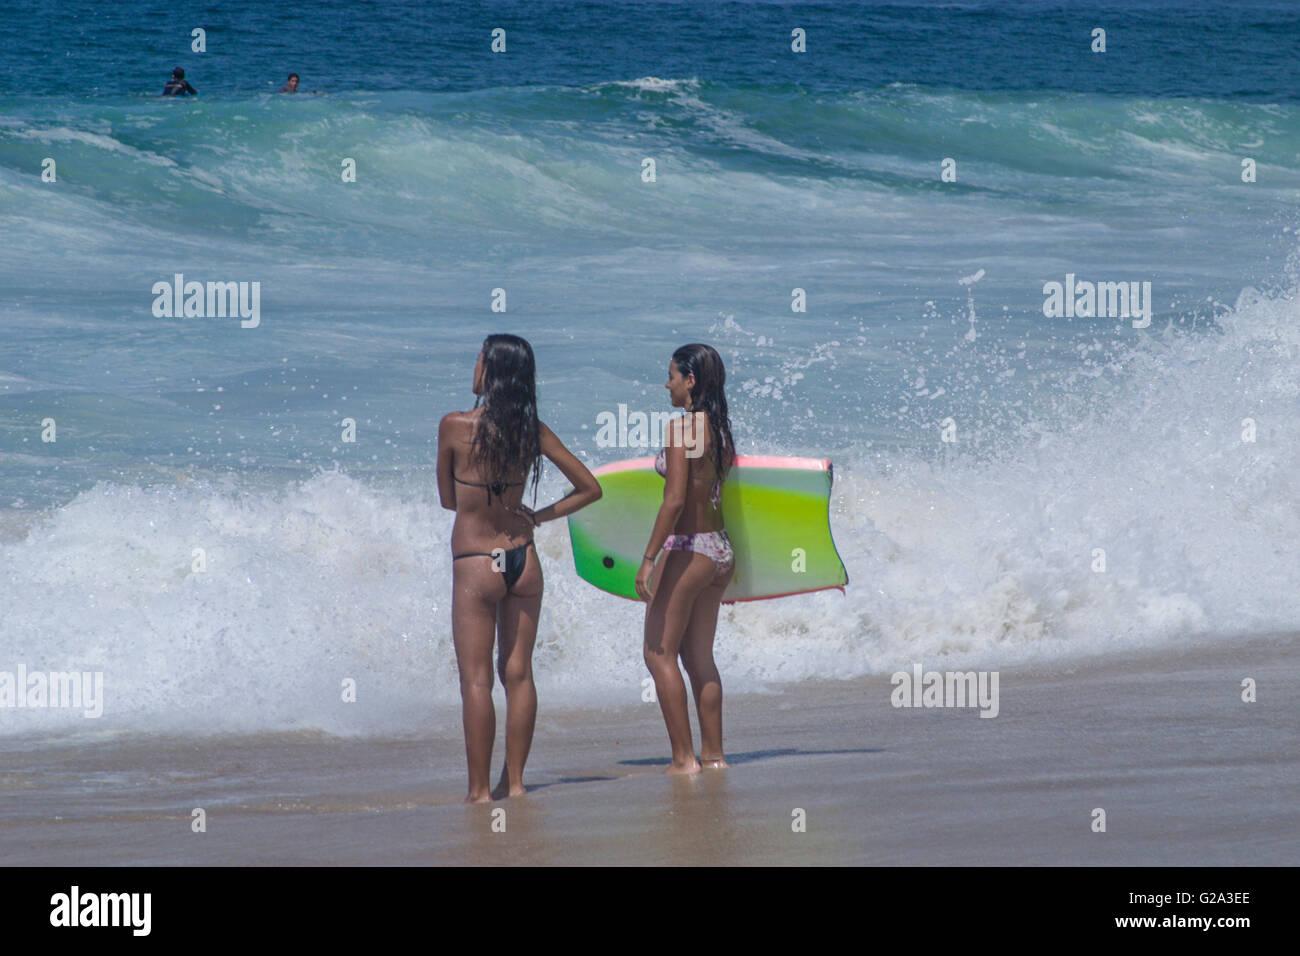 Filles En String Photos les filles avec planche de surf, à rio de janeiro copacabana beach